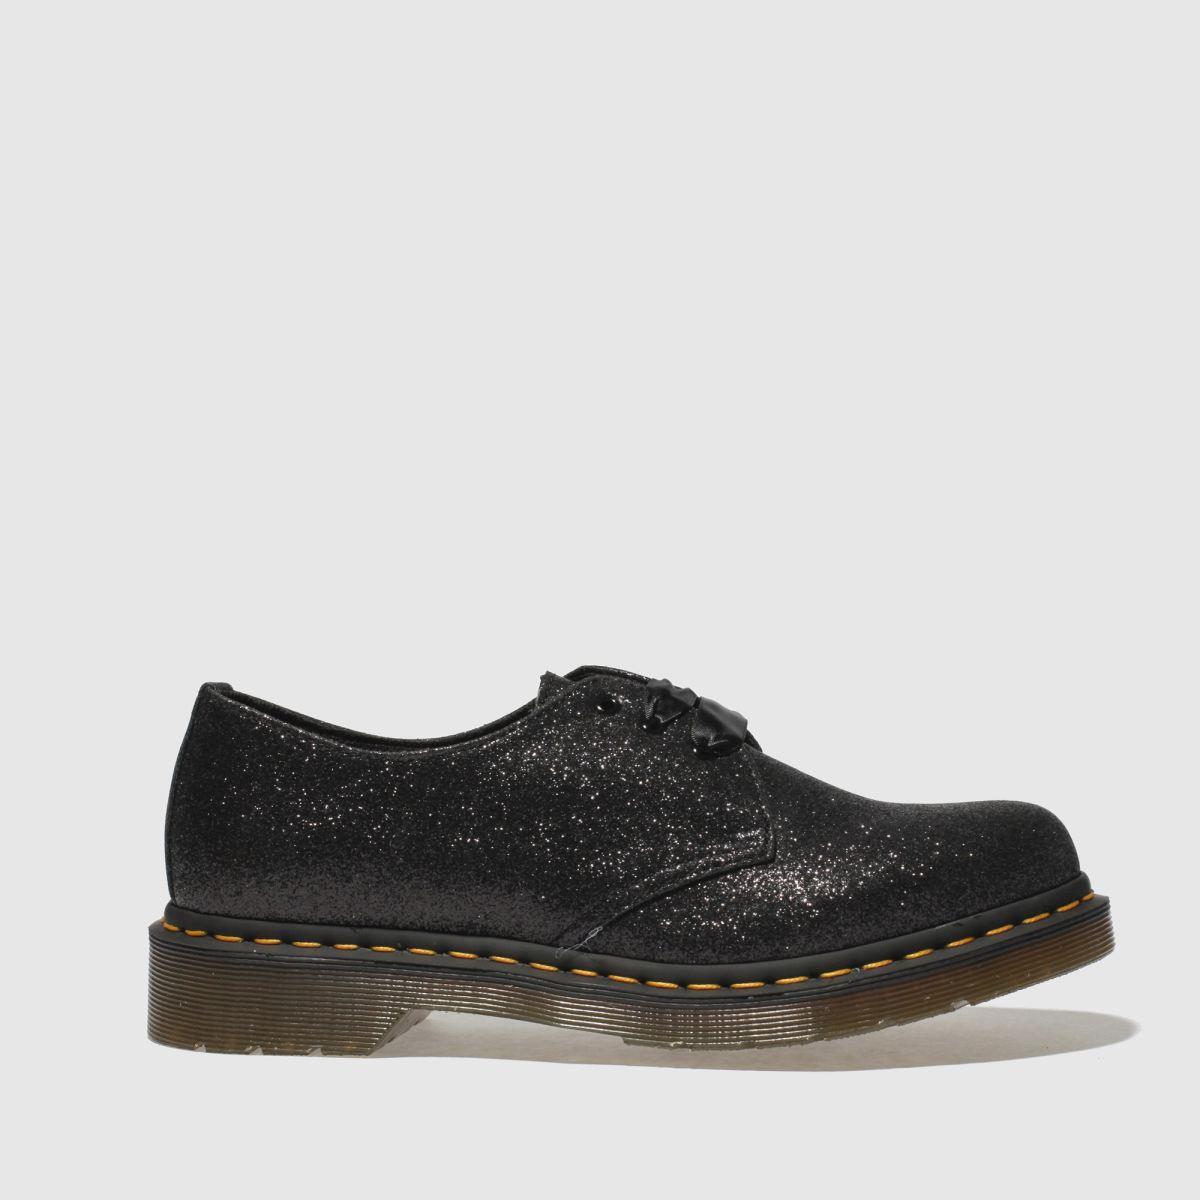 Dr Martens Black & Silver 1461 3 Eye Shoe Glitter Flat Shoes